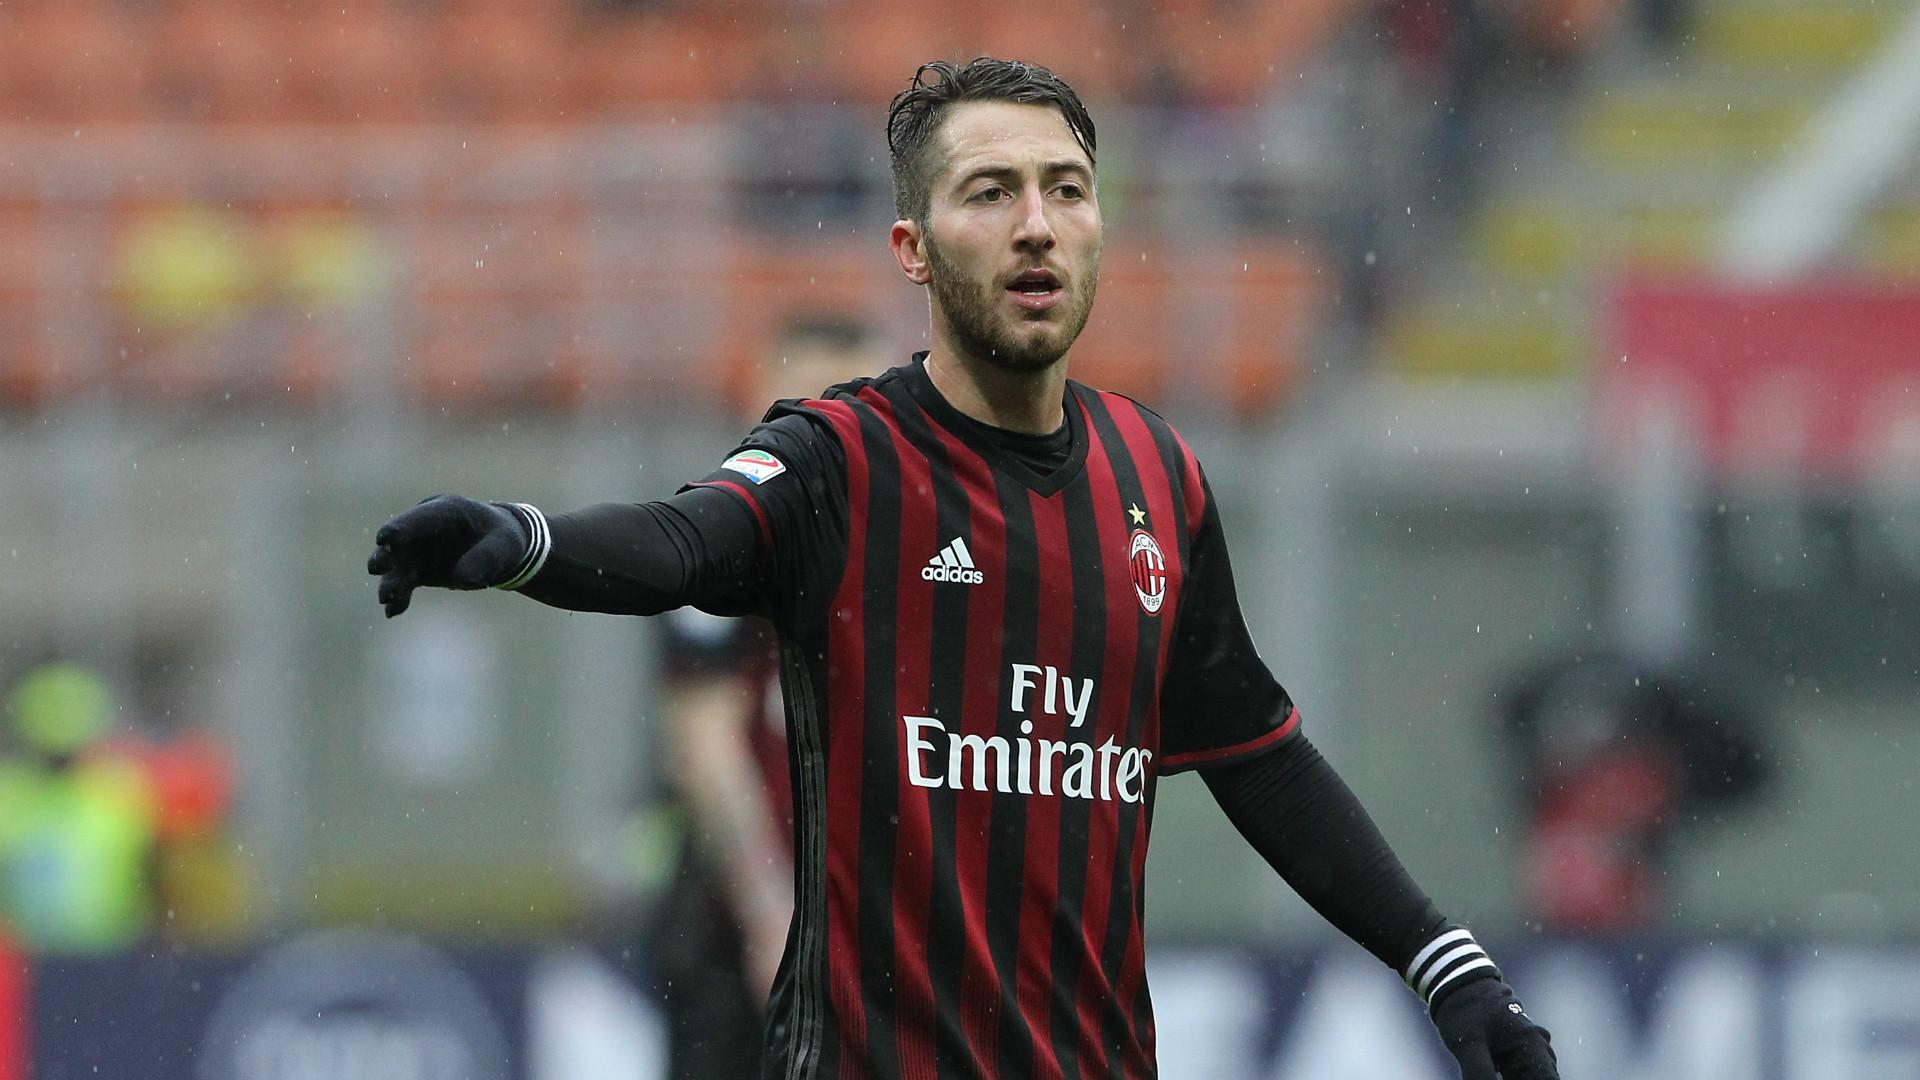 Calcio: Milan ha chiesto Perin al Genoa